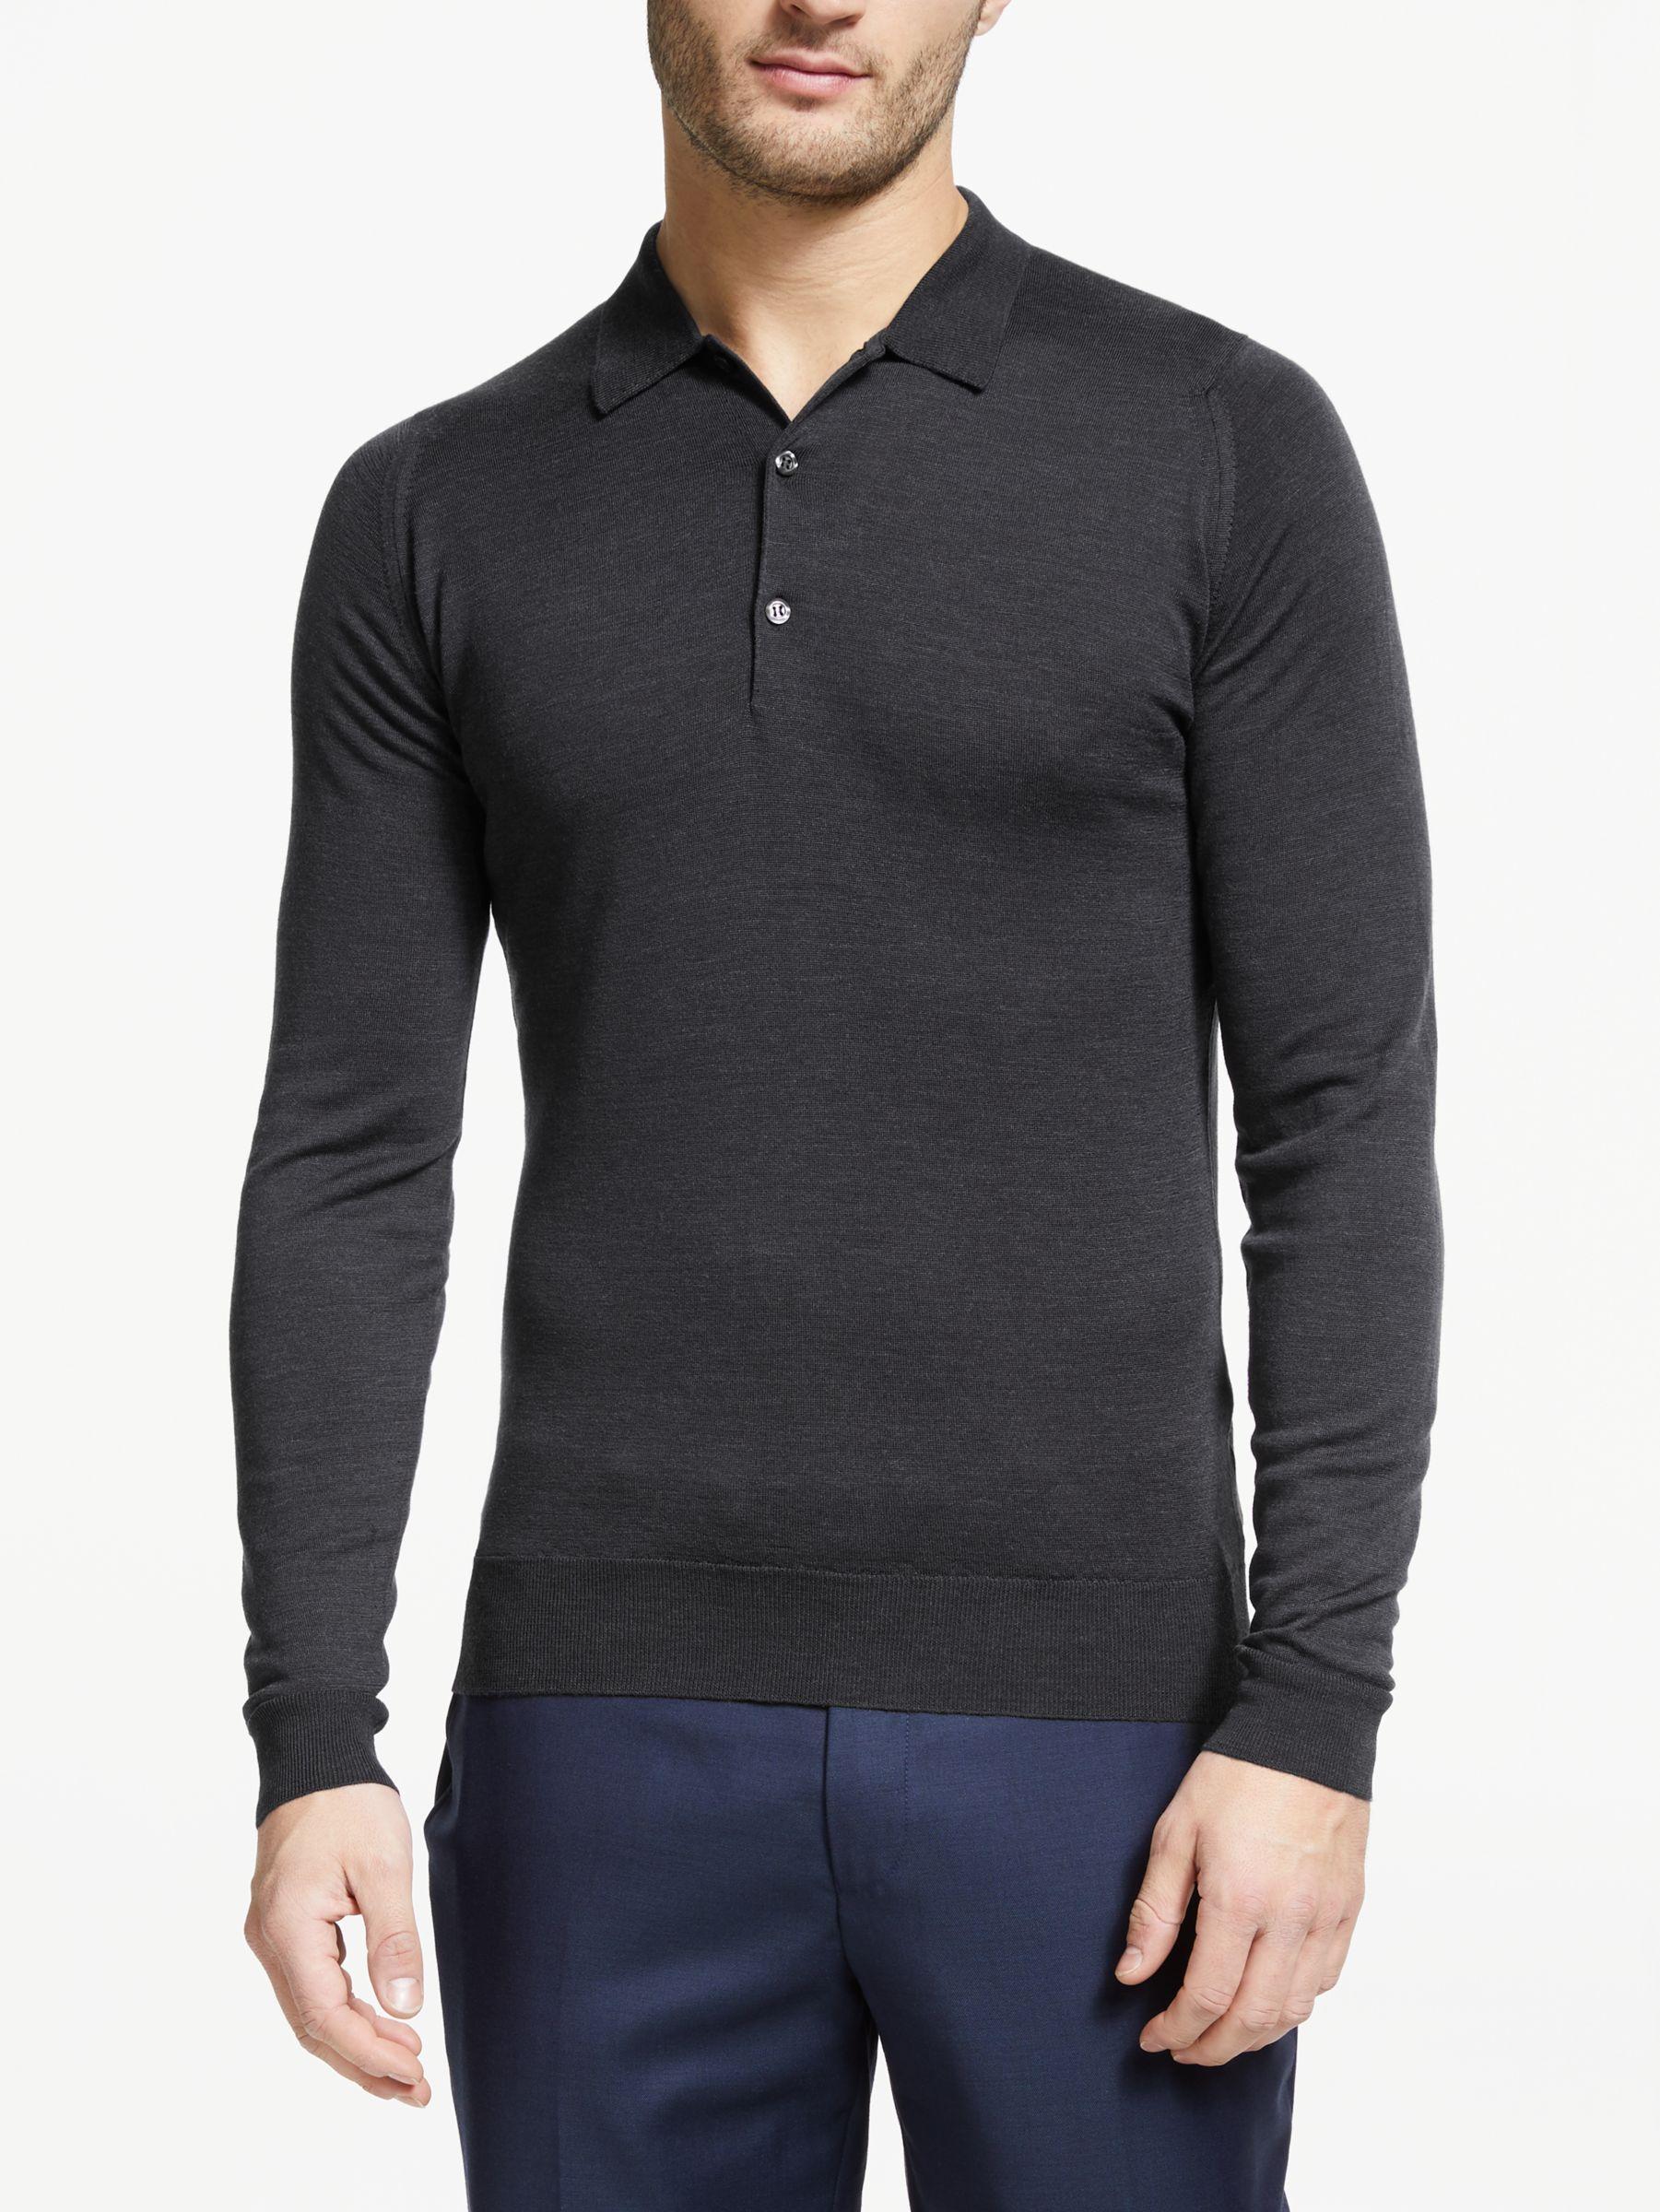 John Smedley John Smedley Belper Long Sleeve Wool Polo Shirt